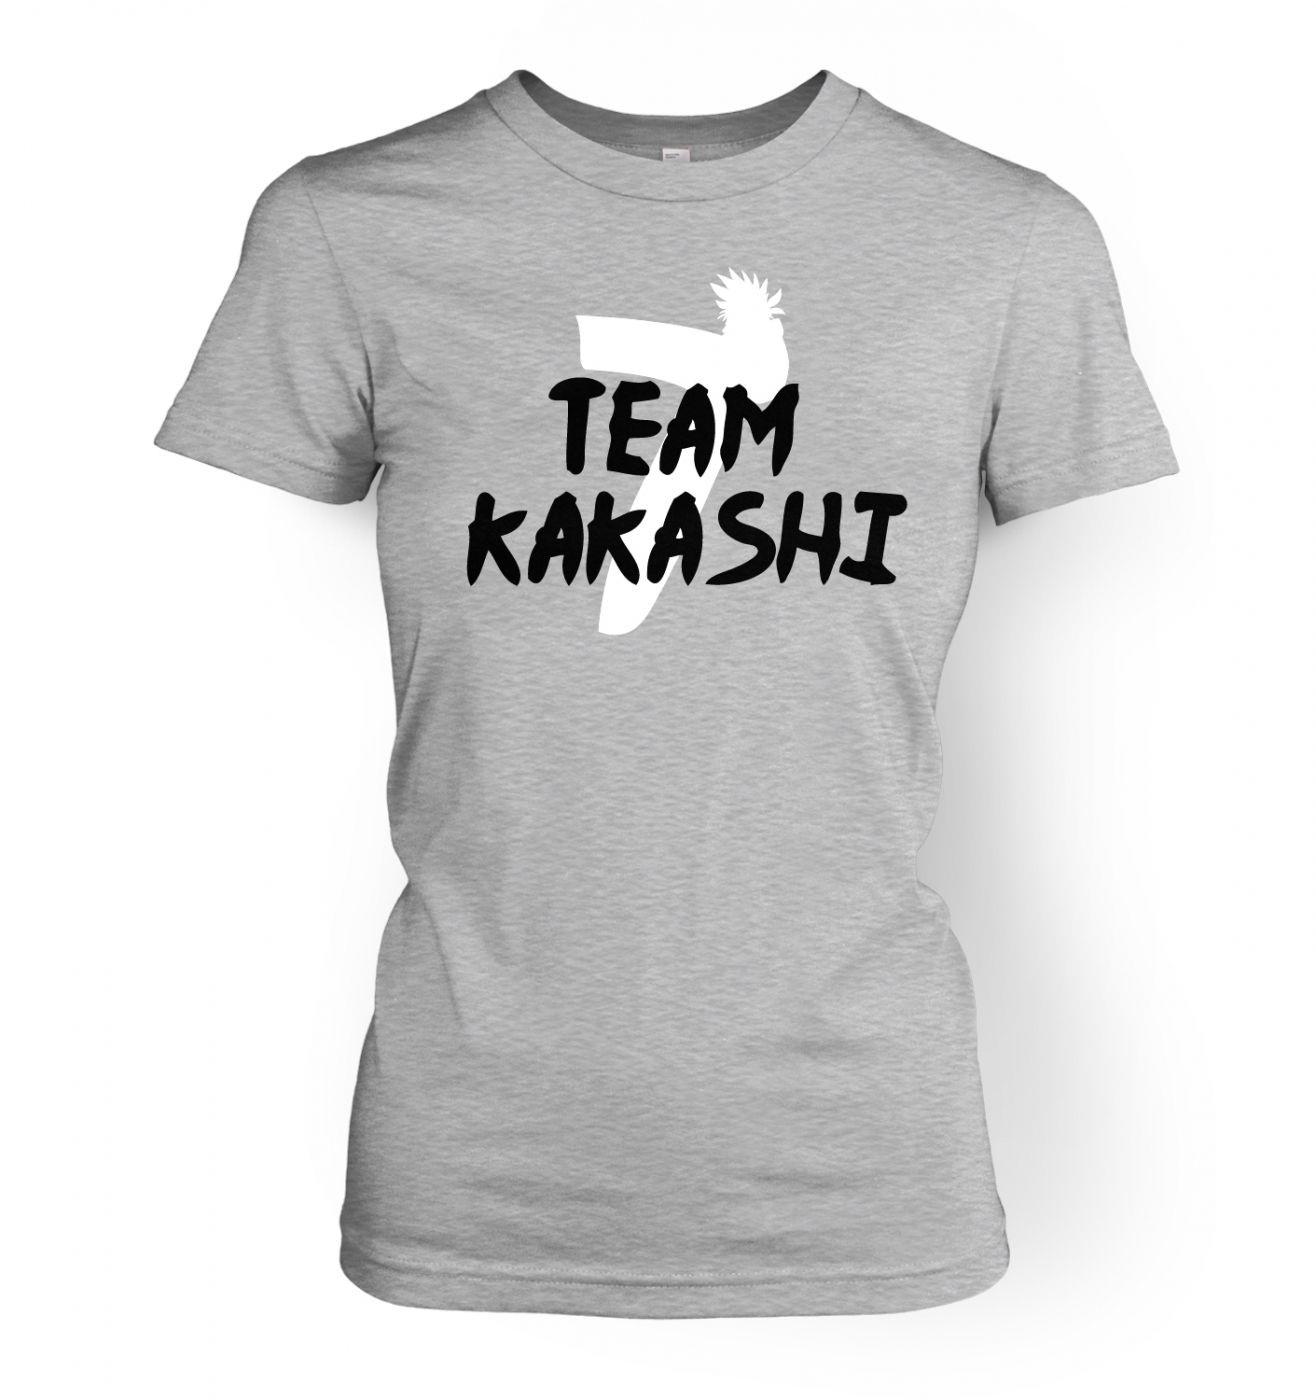 Team Kakashi - Women's T-Shirt